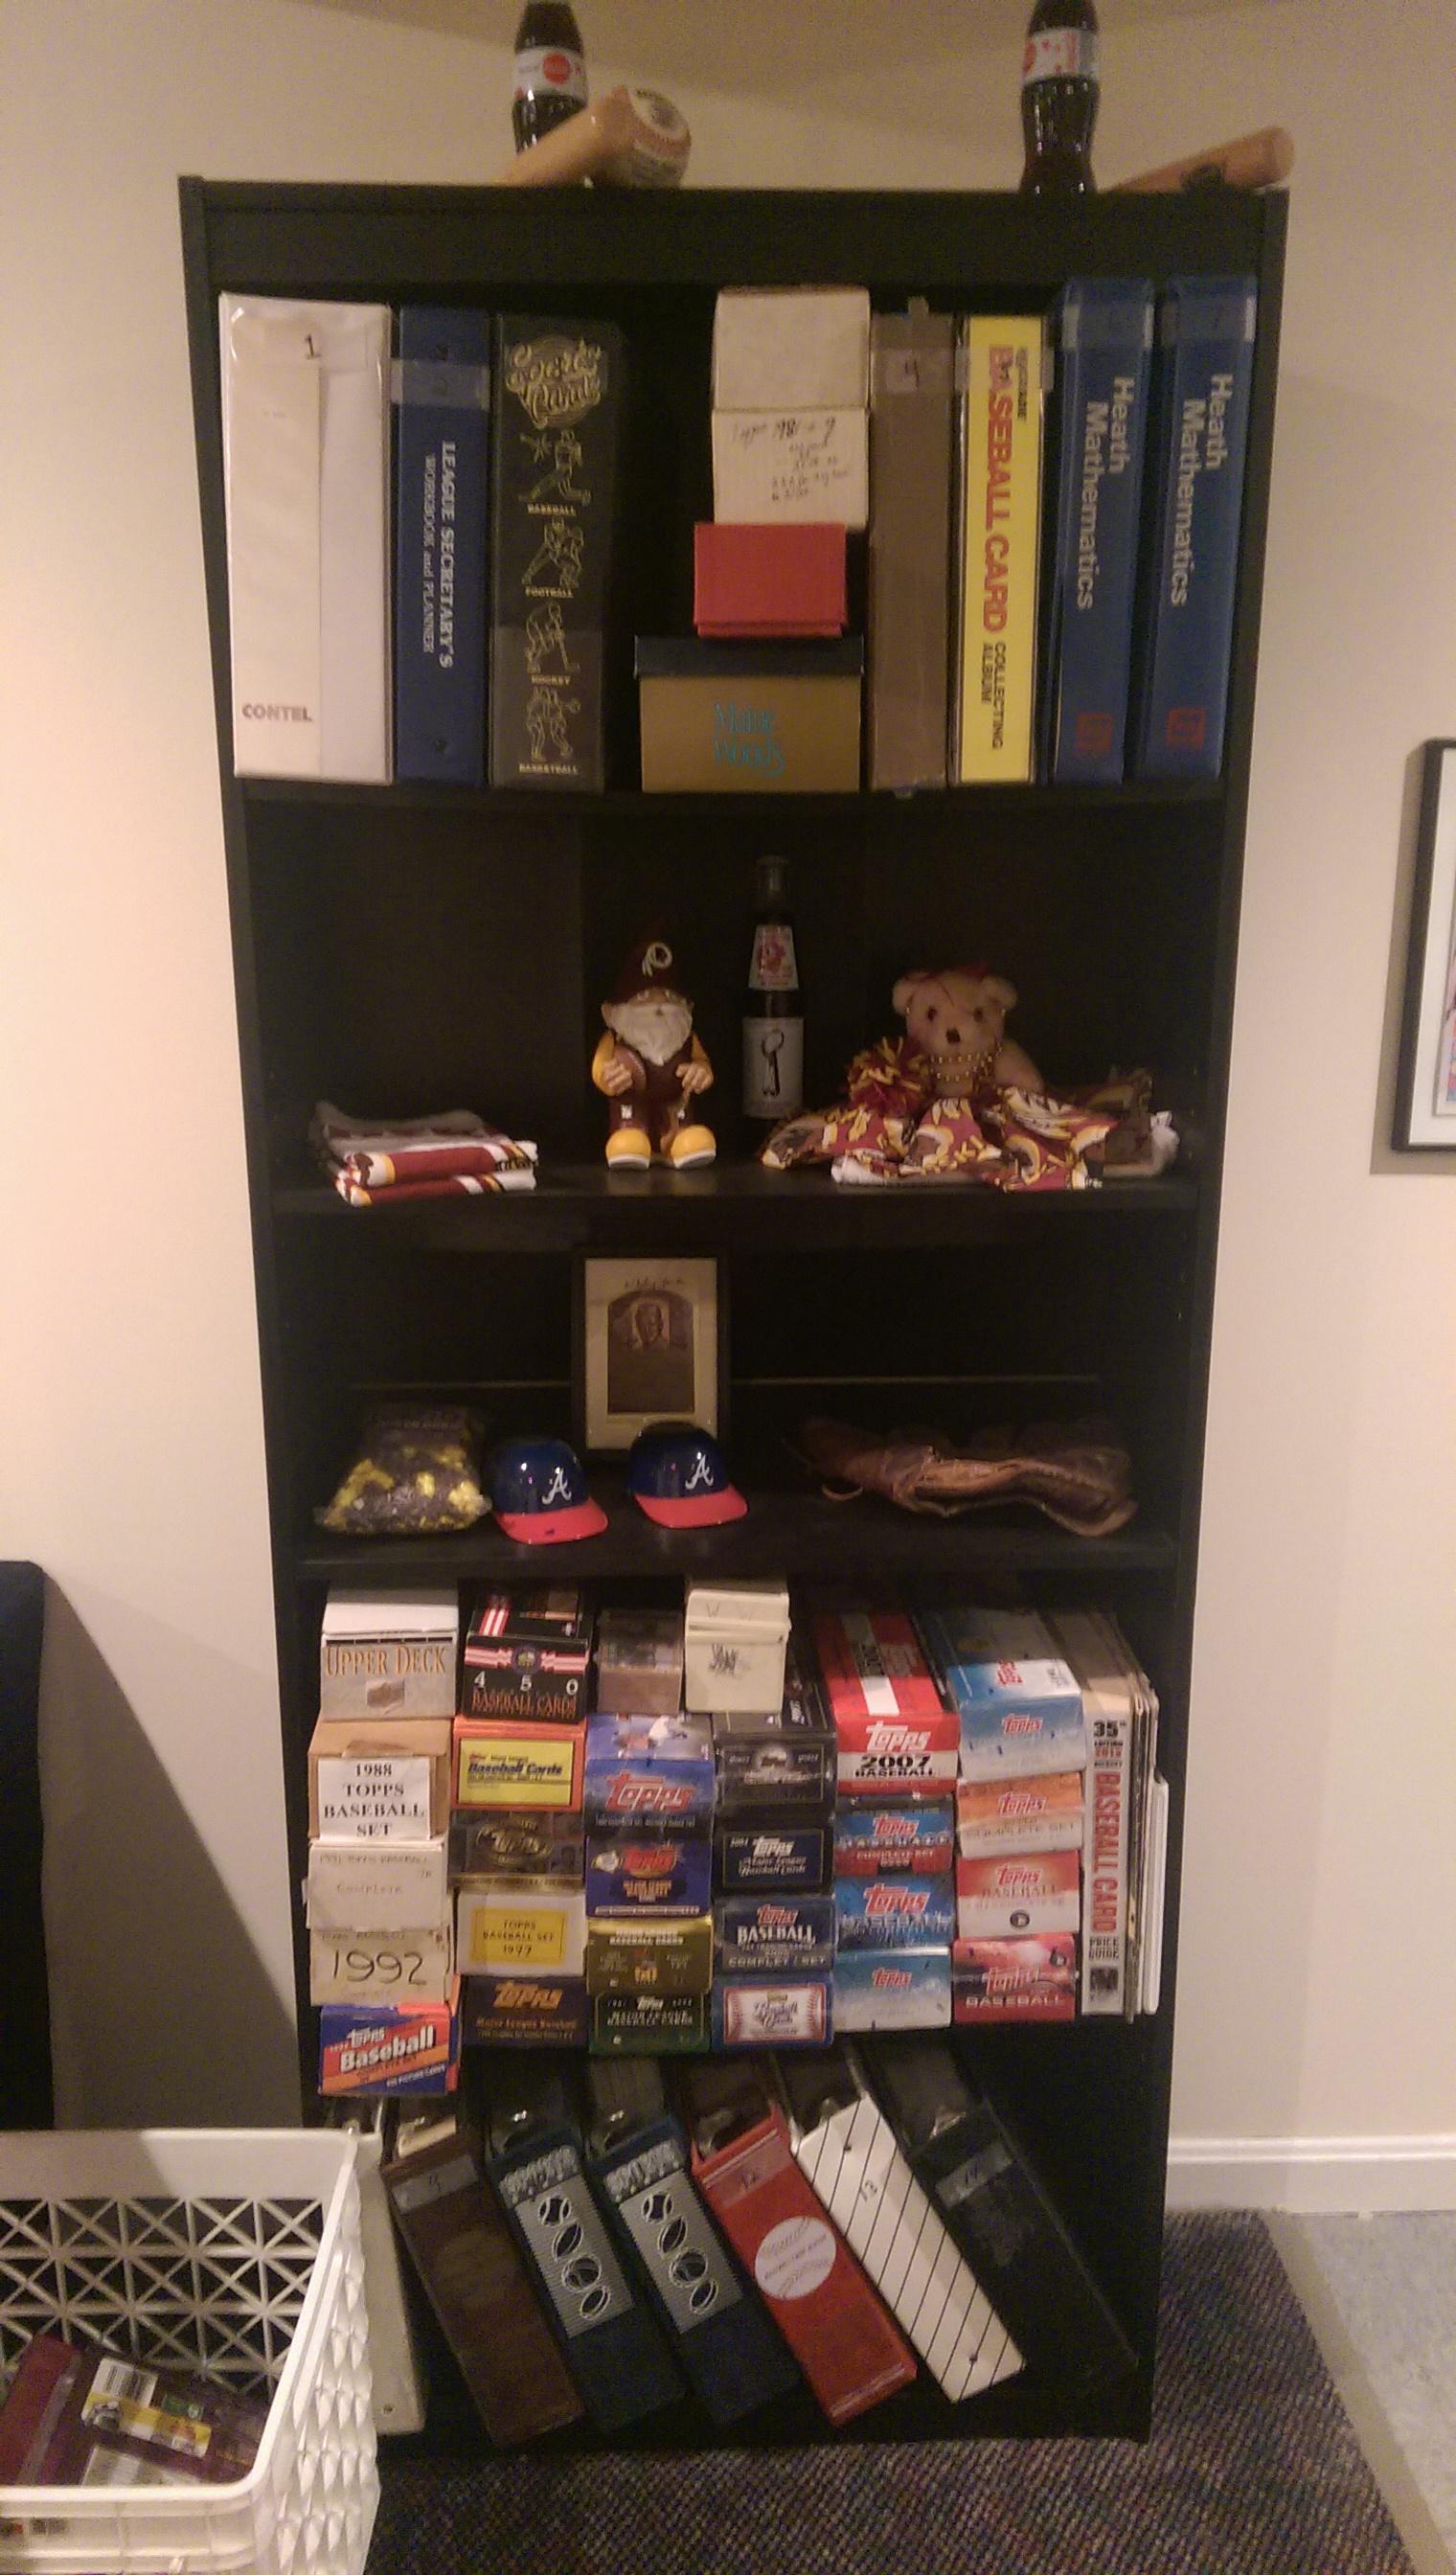 Baseball card shelf. Rizzo slid some of her Redskins stuff onto a shelf.